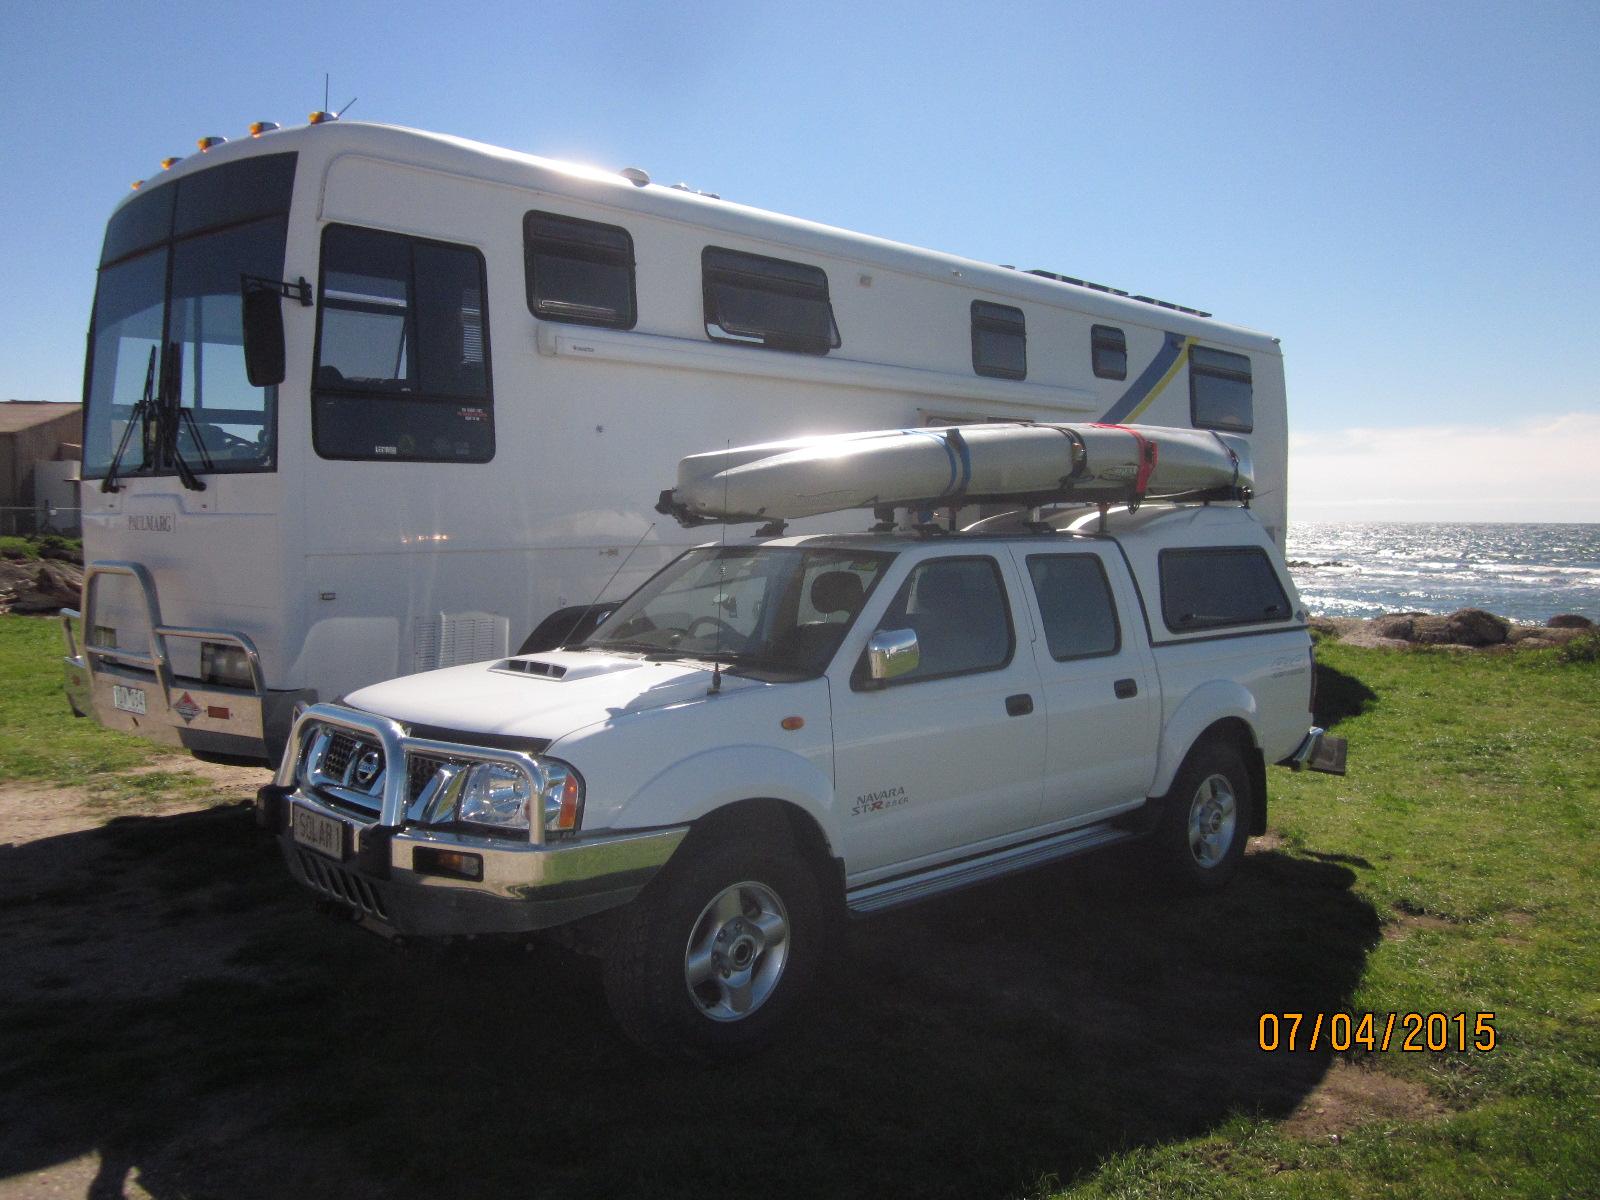 TOURING COMBO   Denning Coach with Pegasus   2004 Conversion and 2014 Navara Dual Cab 4x4...